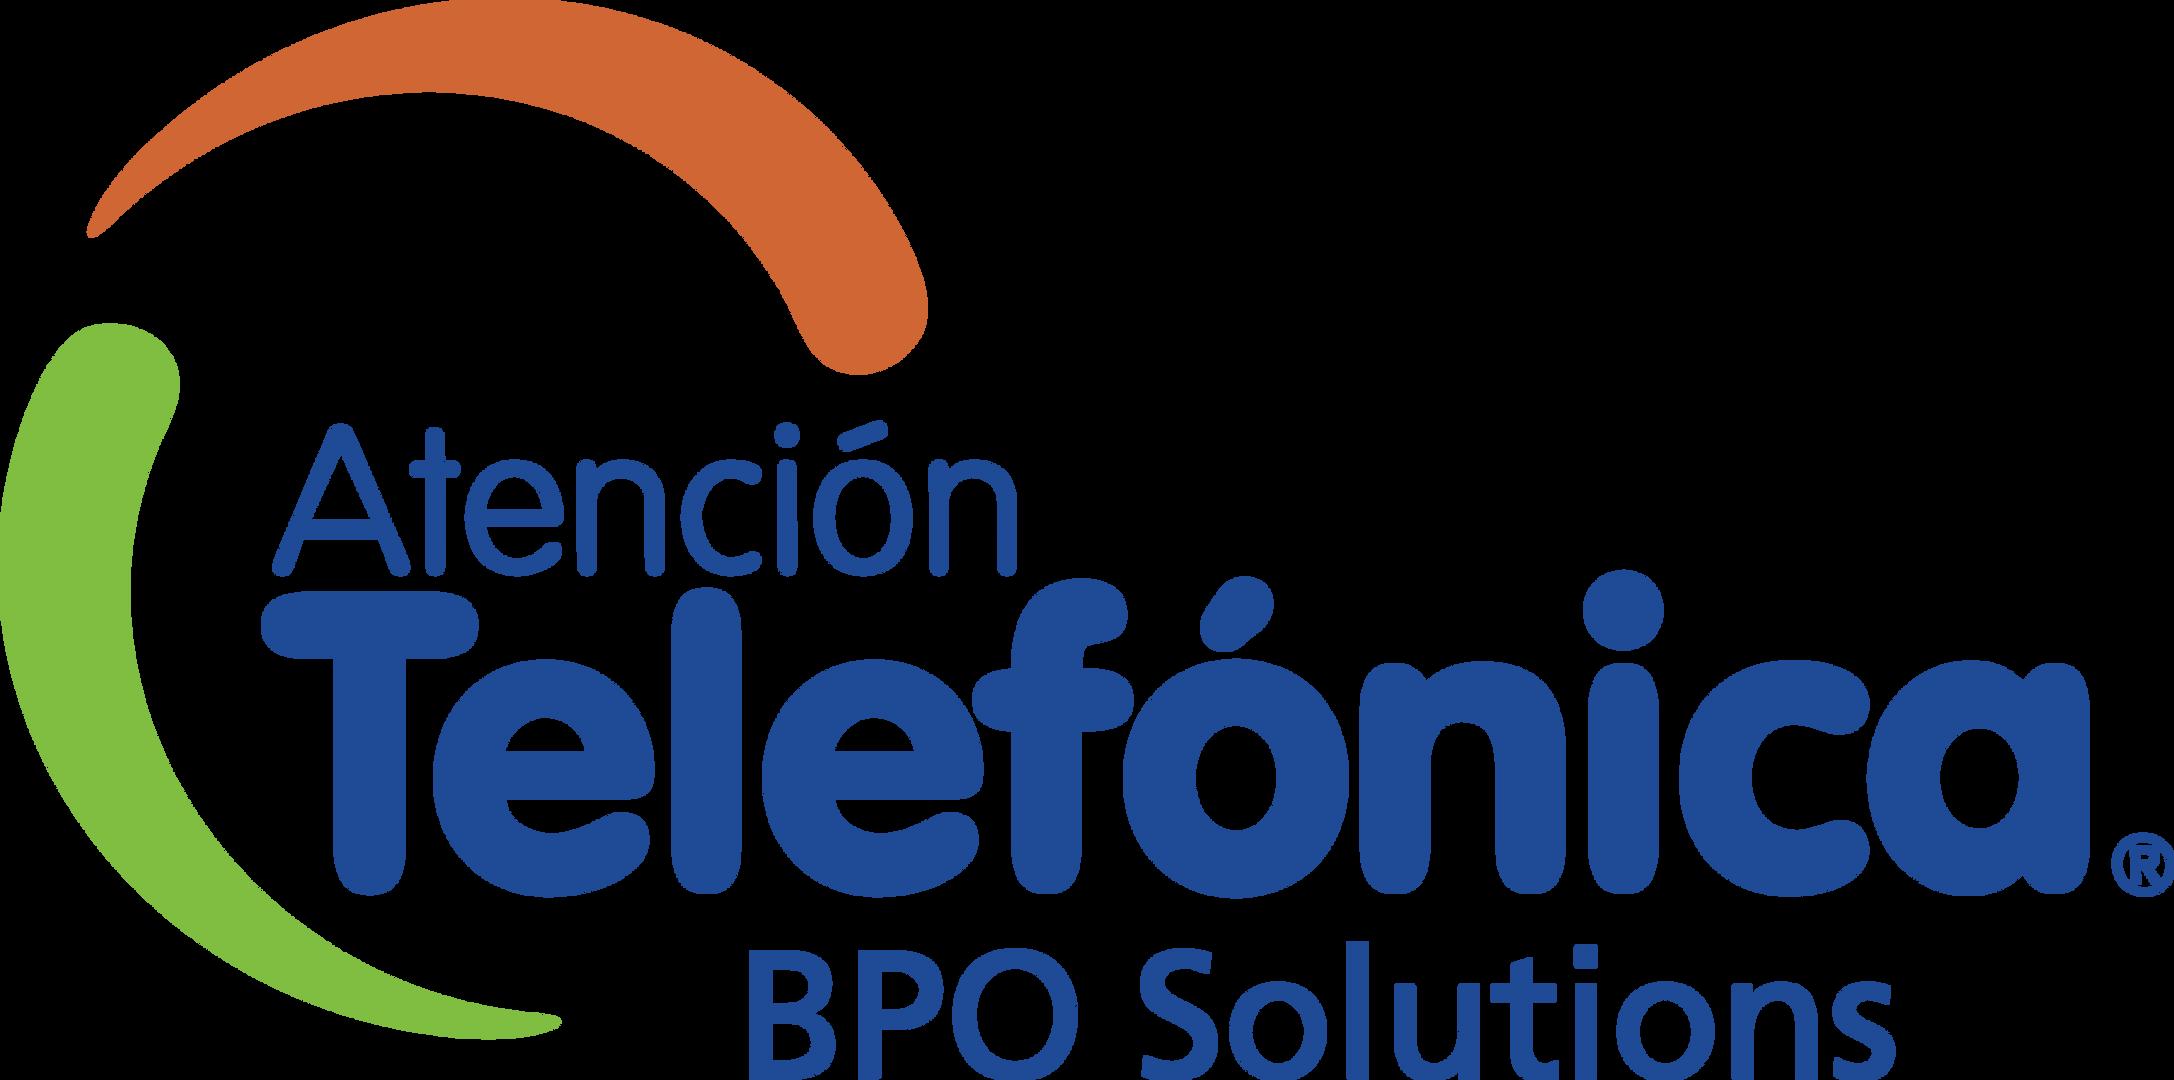 ATENCION_TELEFONICA.png